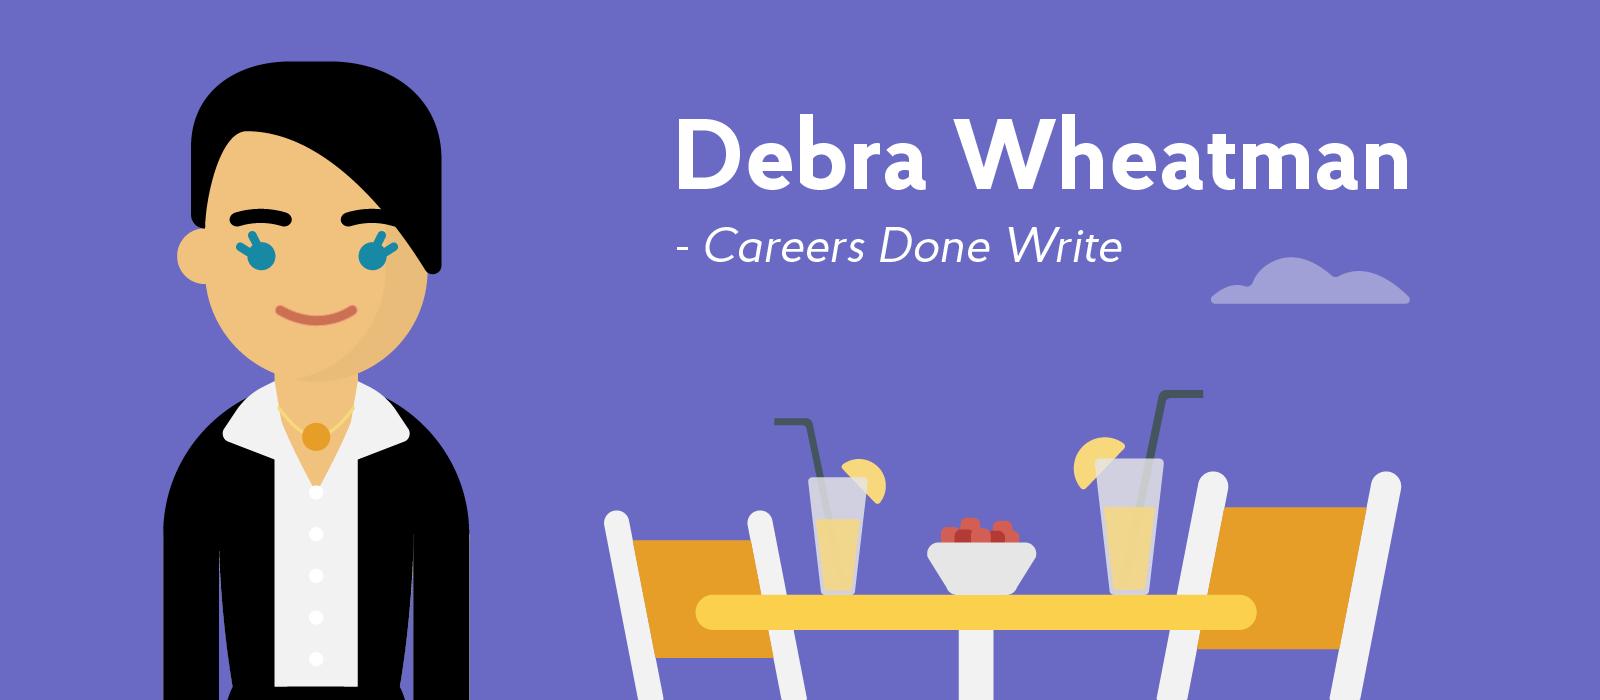 Debra Wheatman career influencer